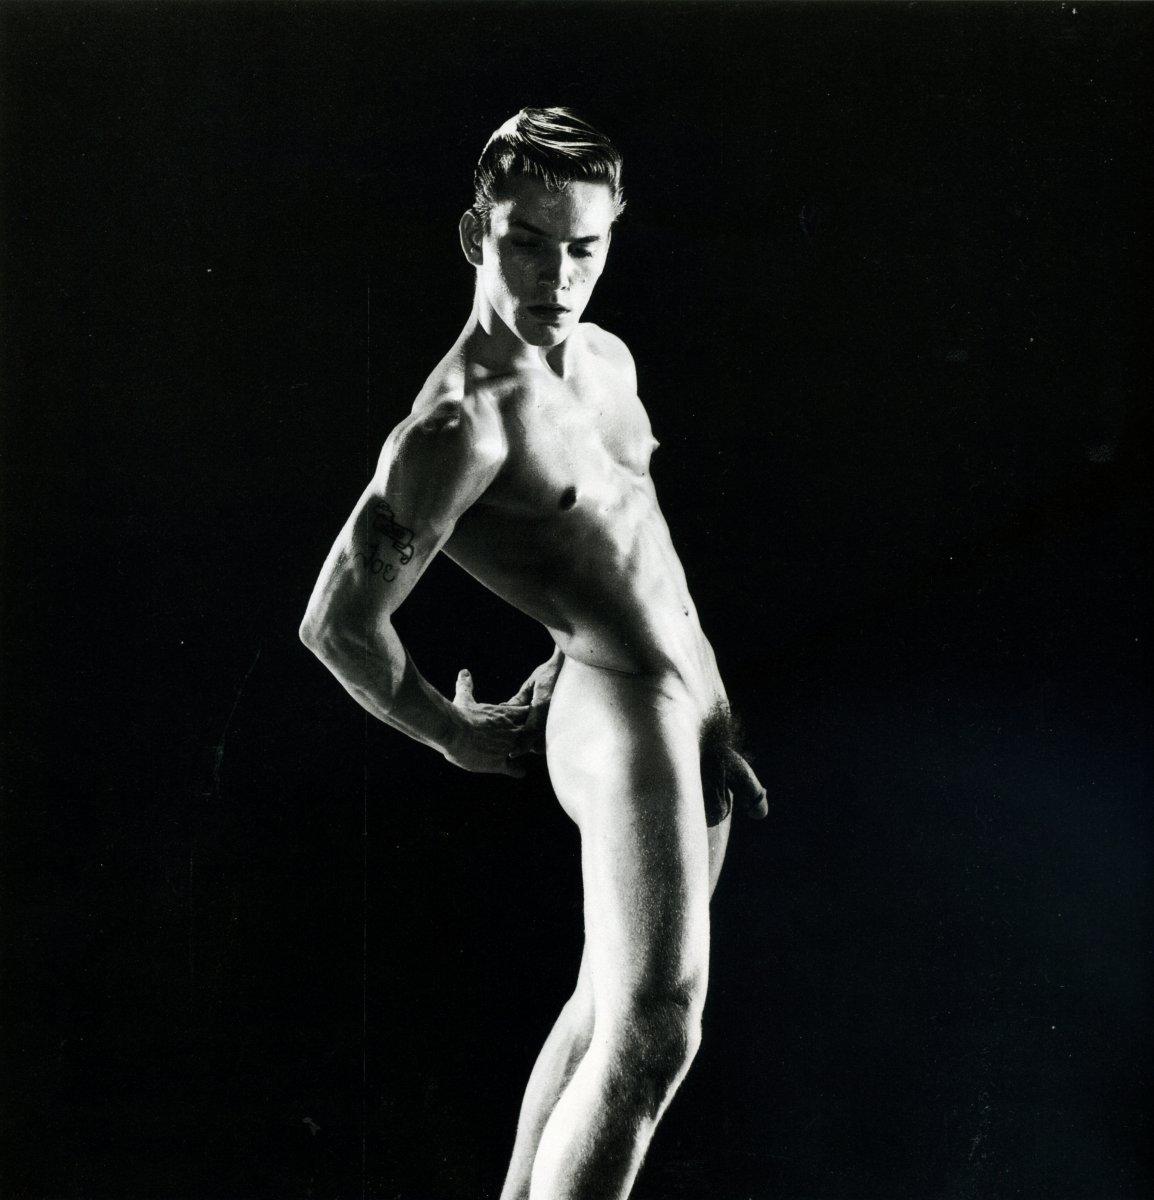 Nude gay dance